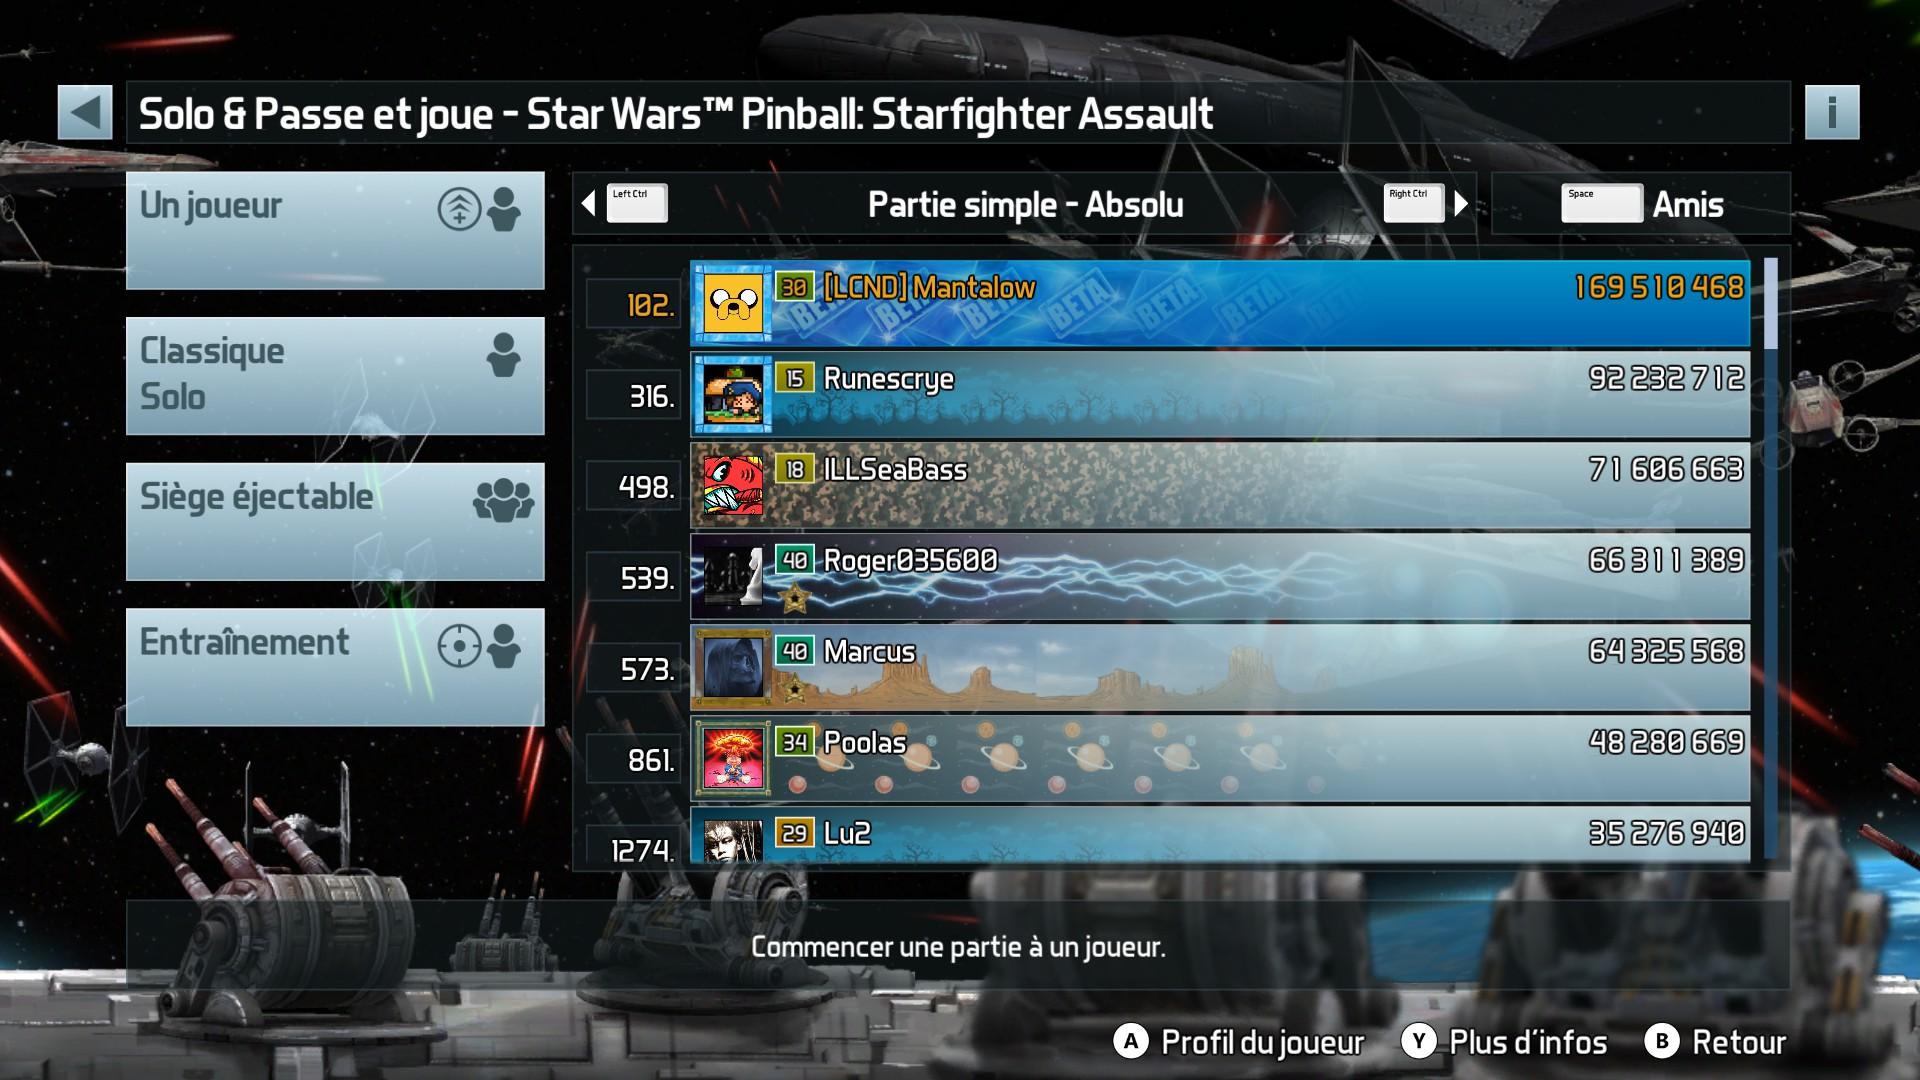 Mantalow: Pinball FX3: Star Wars Pinball: Starfighter Assault (PC) 169,510,468 points on 2017-12-19 10:52:06